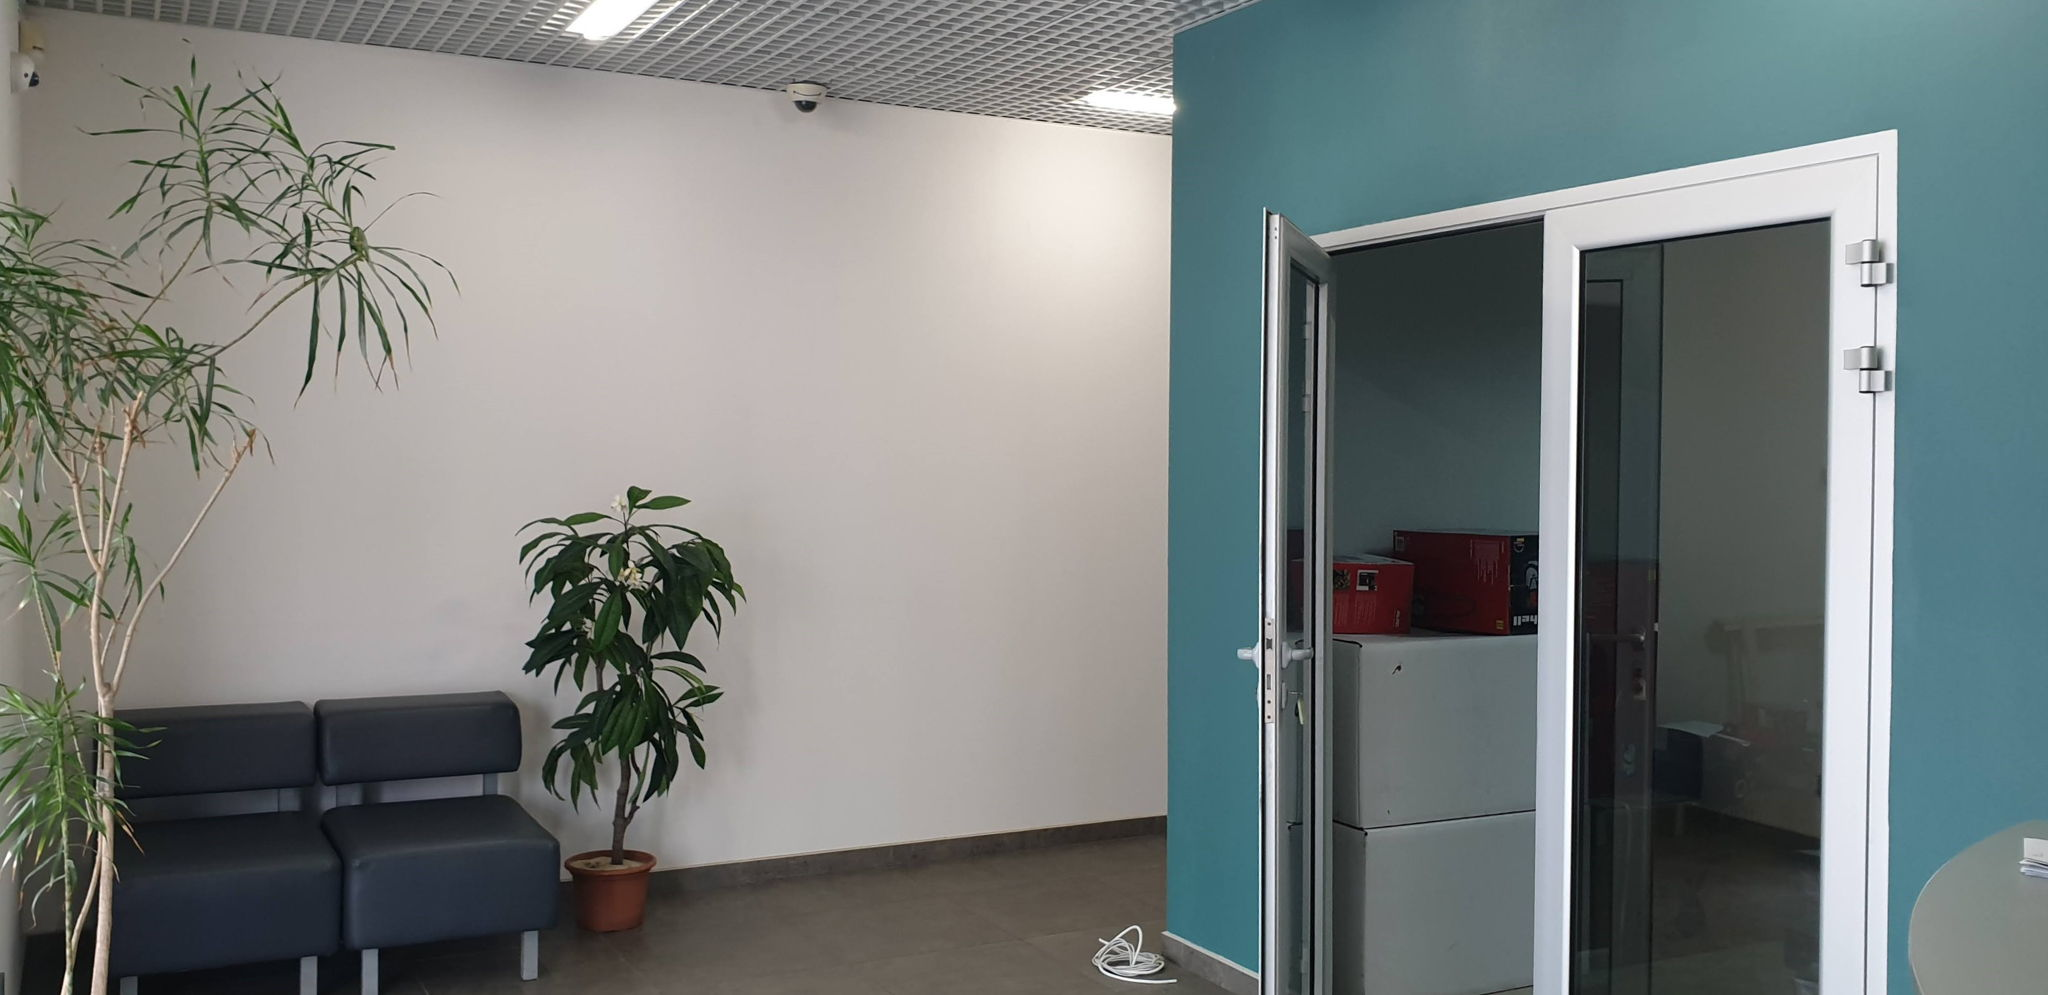 Офис, W-6300891, Набережно-Луговая, 29, Киев - Фото 6